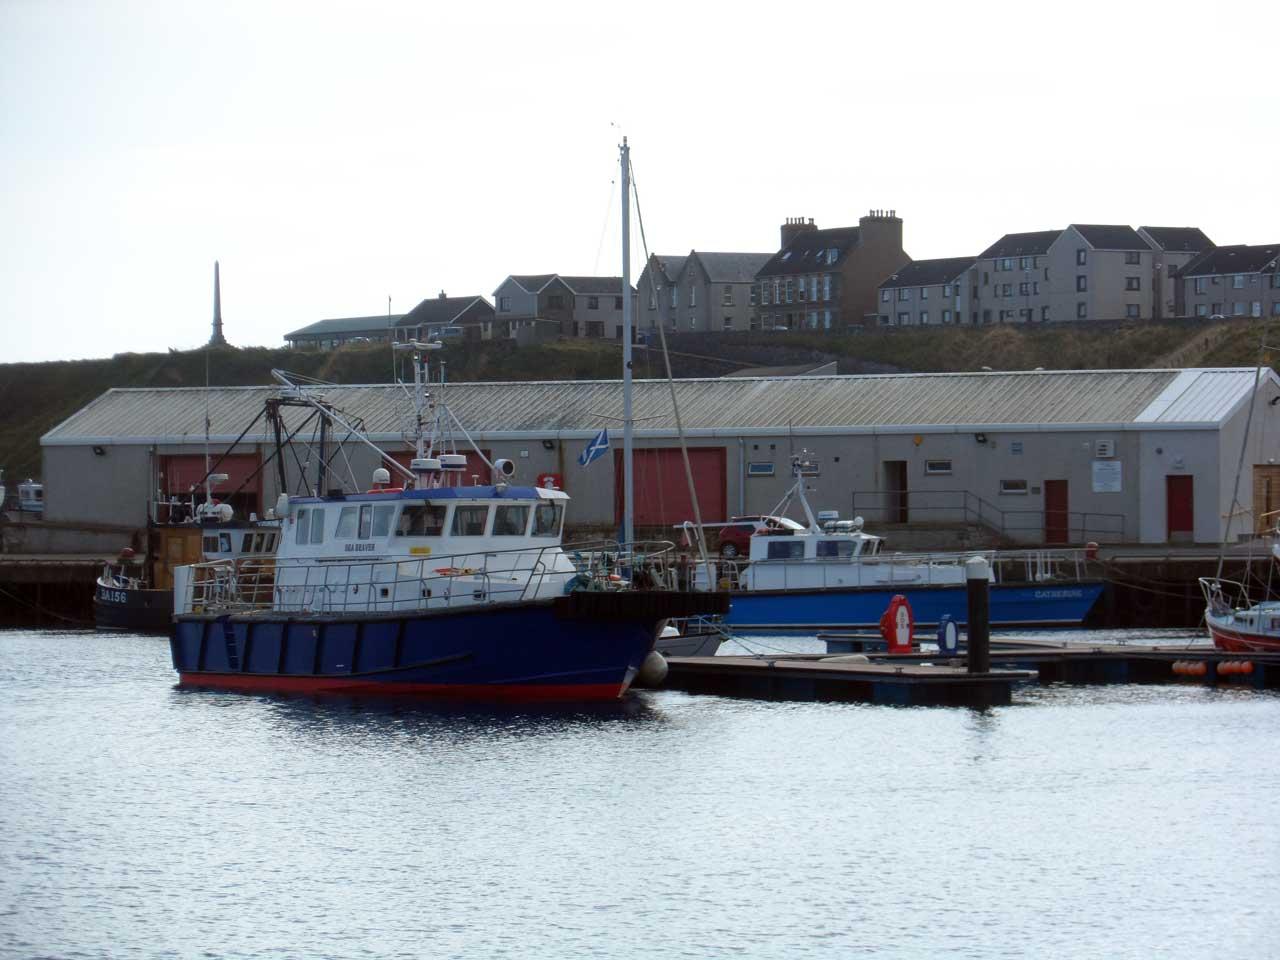 Photo: Wick Harbour - 27 September 2014